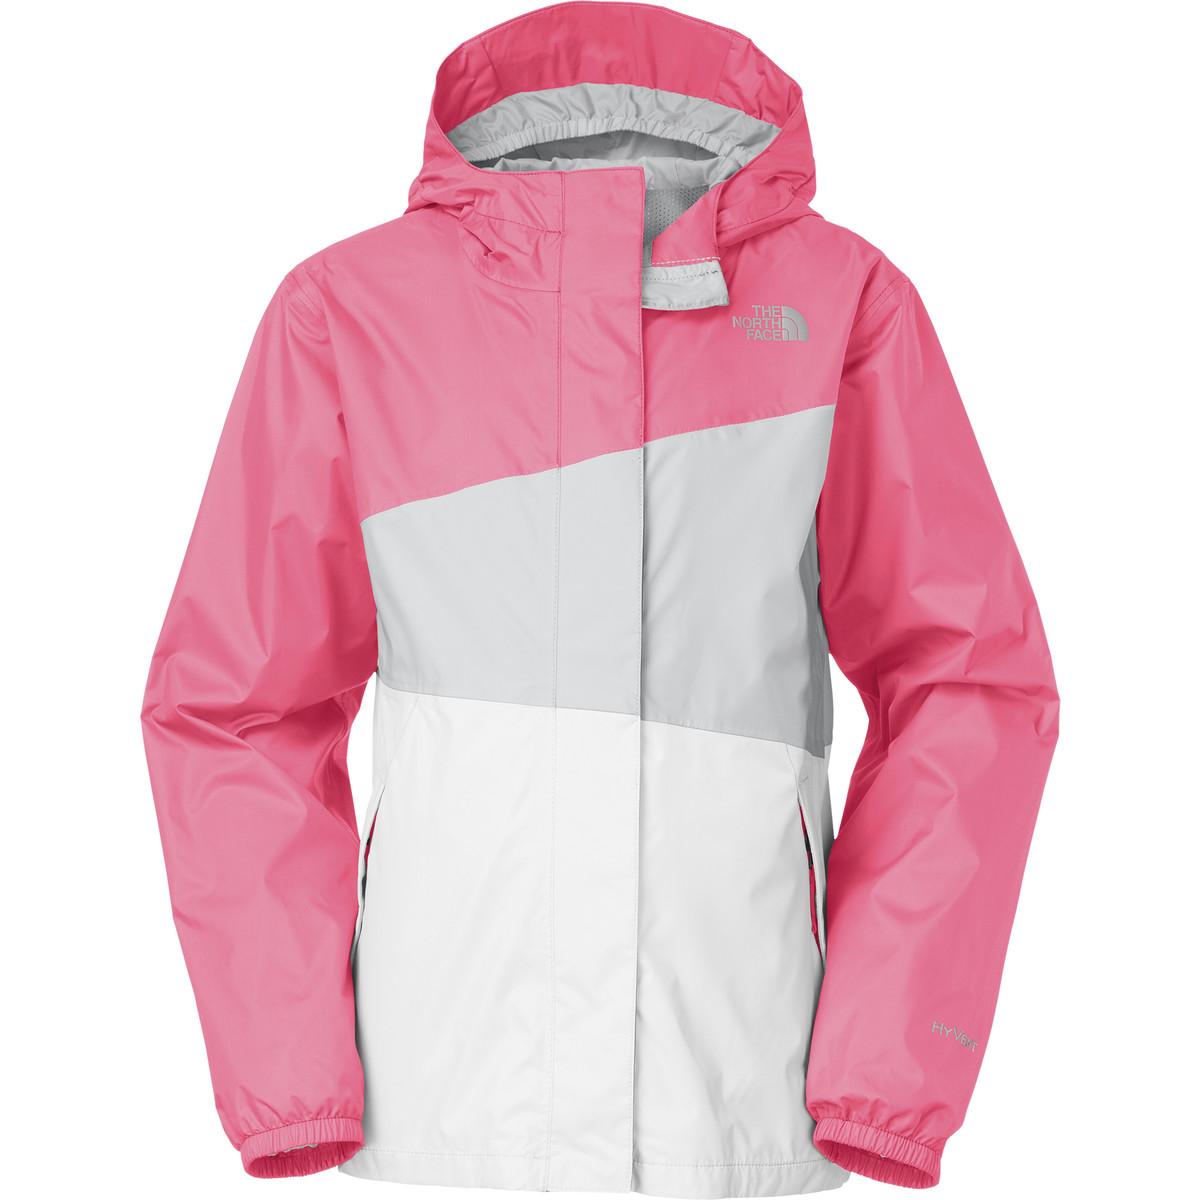 The North Face Caiman Rain Jacket